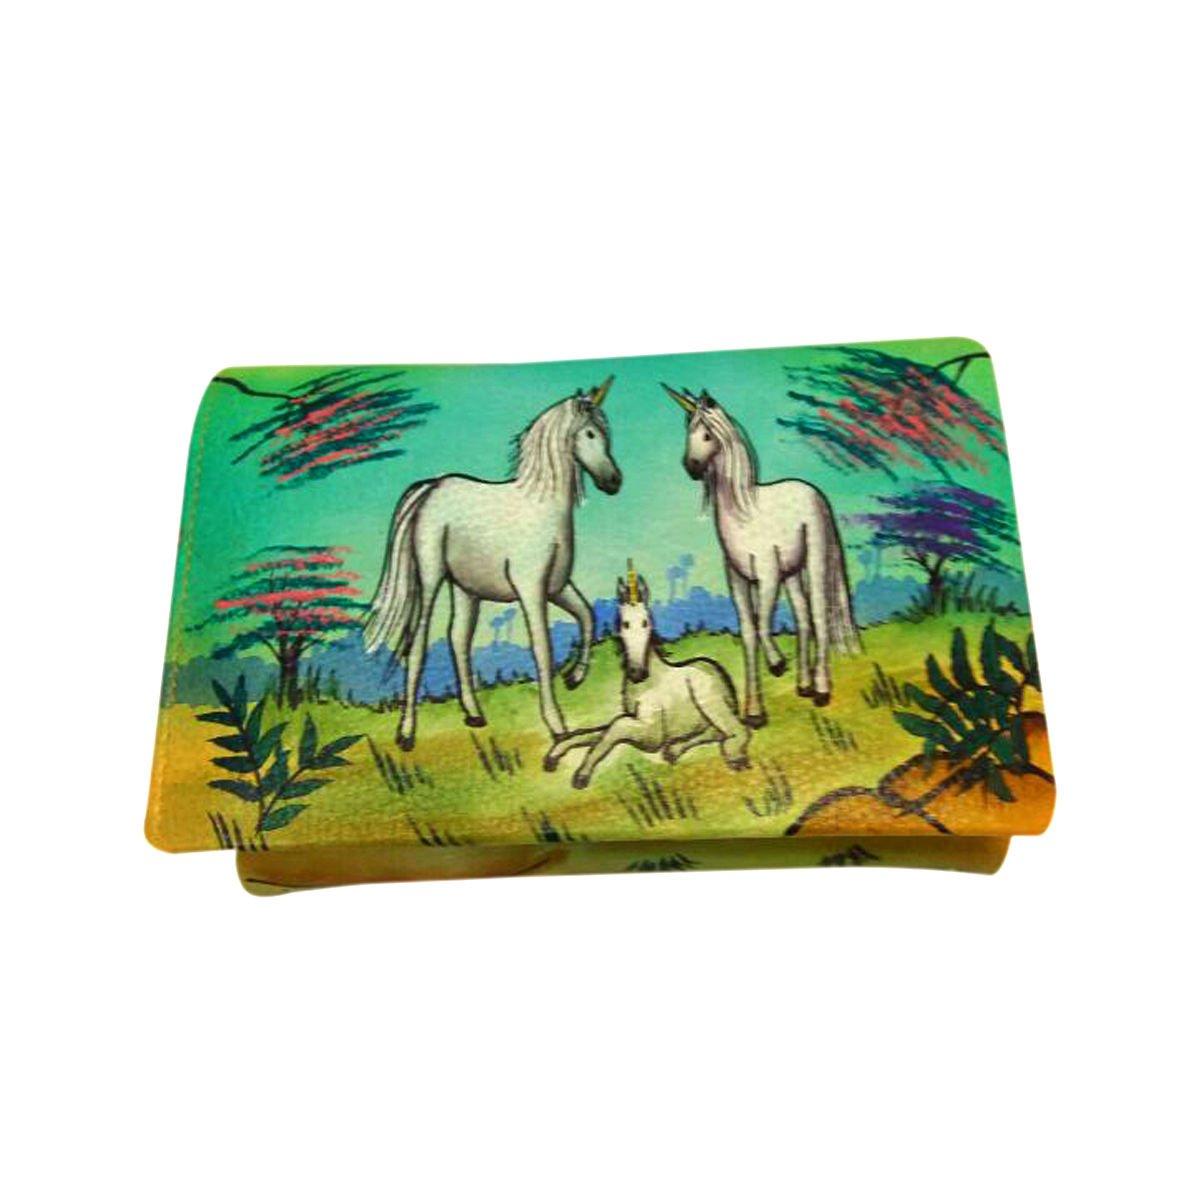 Genuine leather money card organizer Large Womens Luxury Coin Purse Hand Painted (Summer Dream Unicorns)